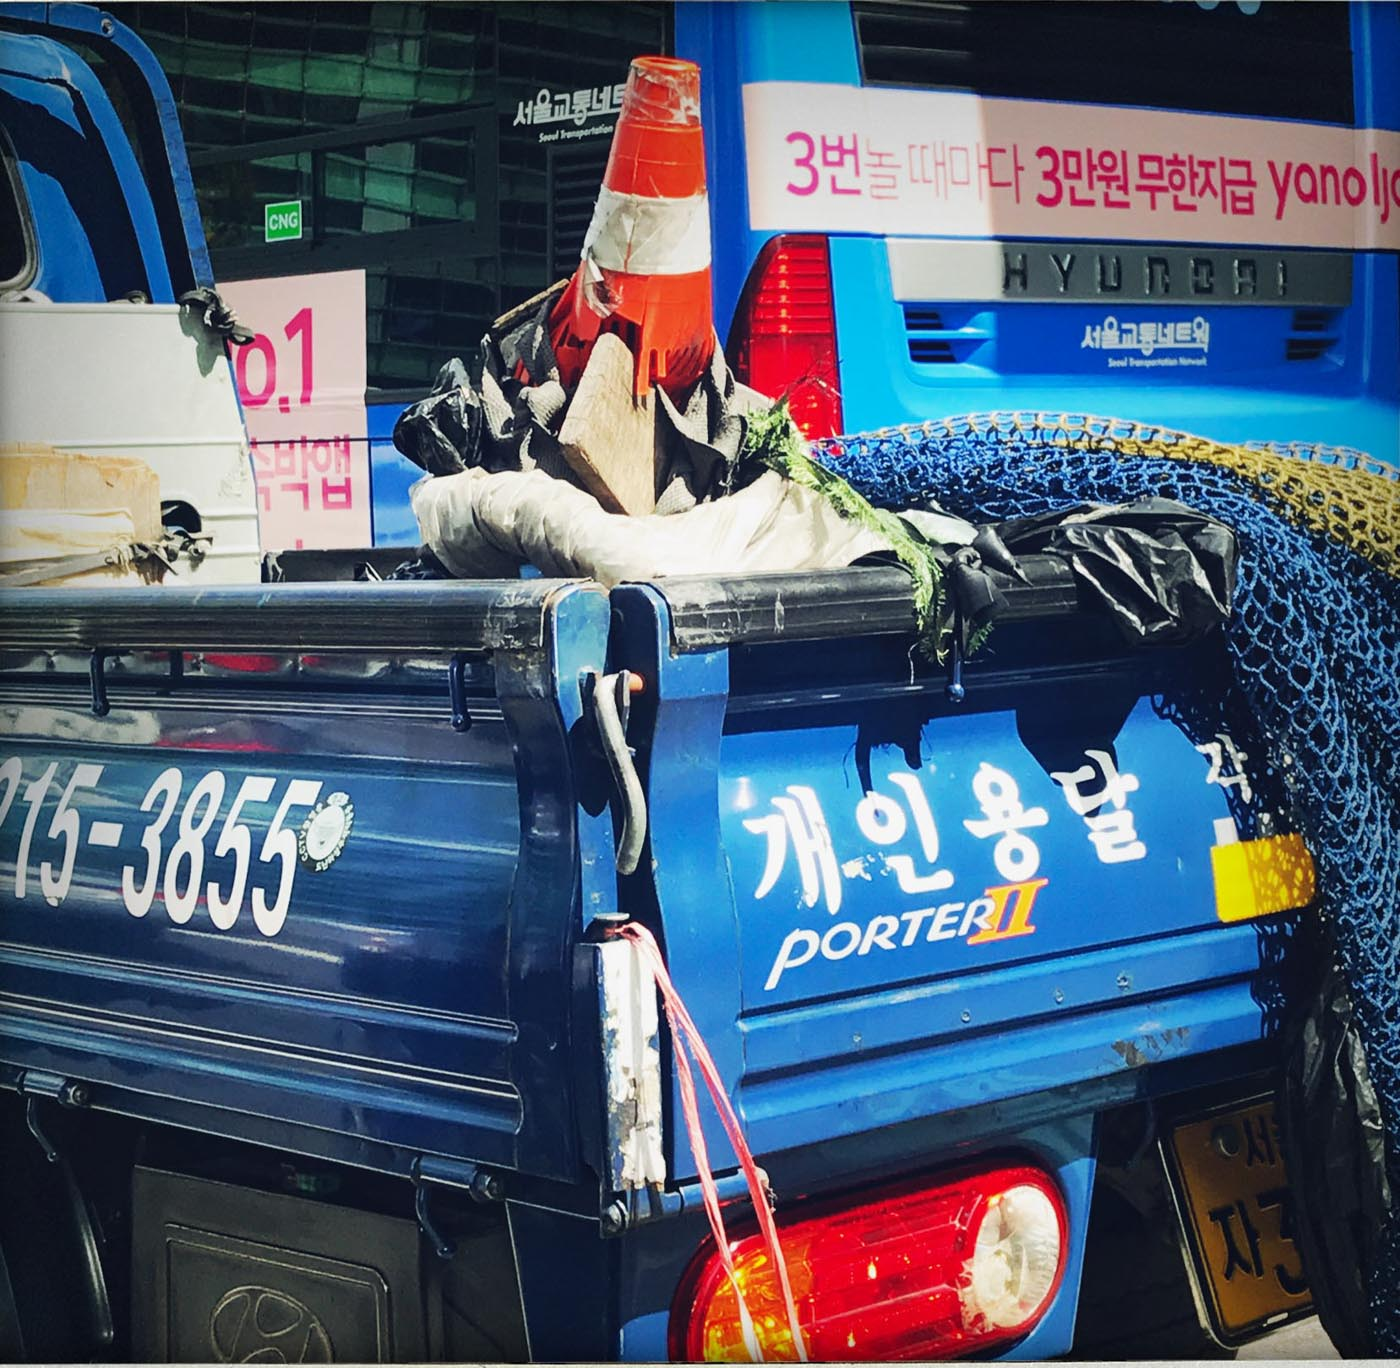 Seoul iphone